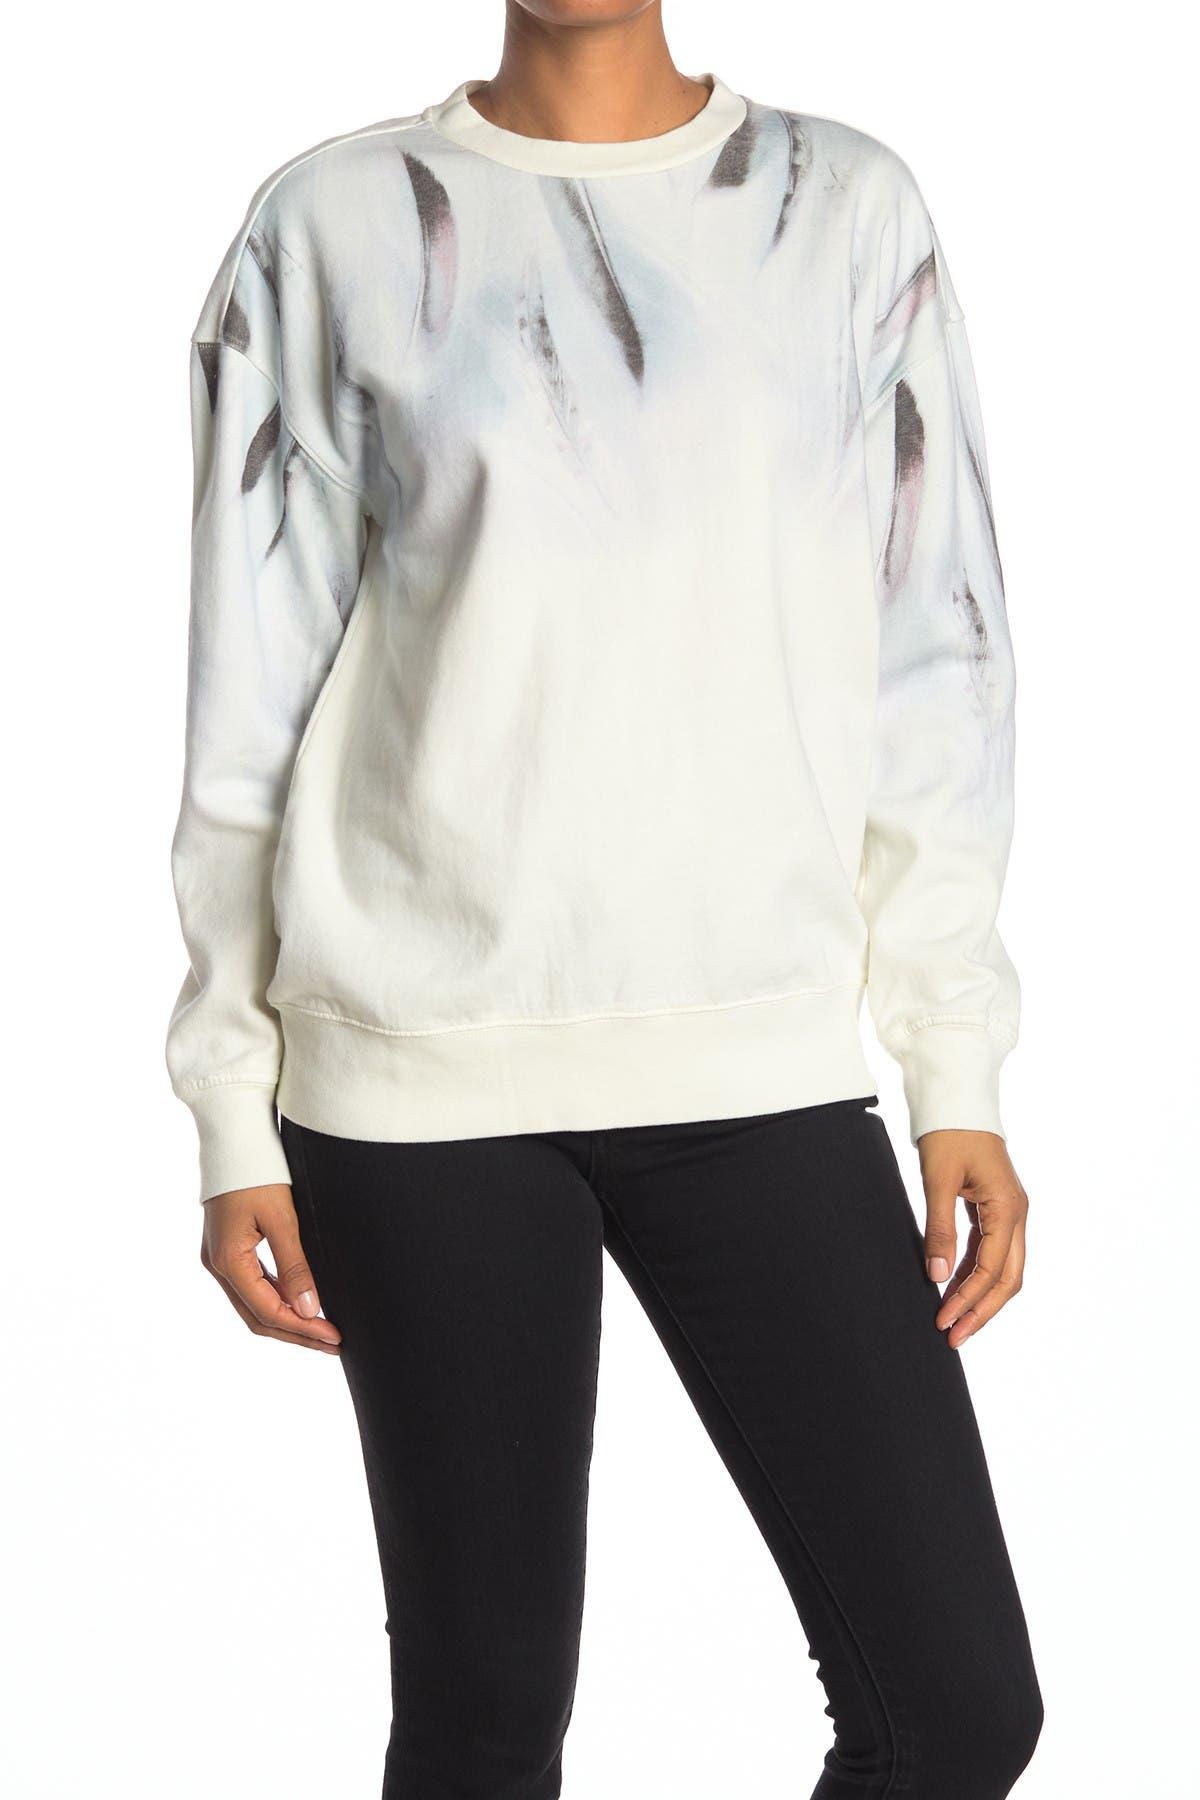 Image of ALLSAINTS Plume Joy Pullover Sweatshirt